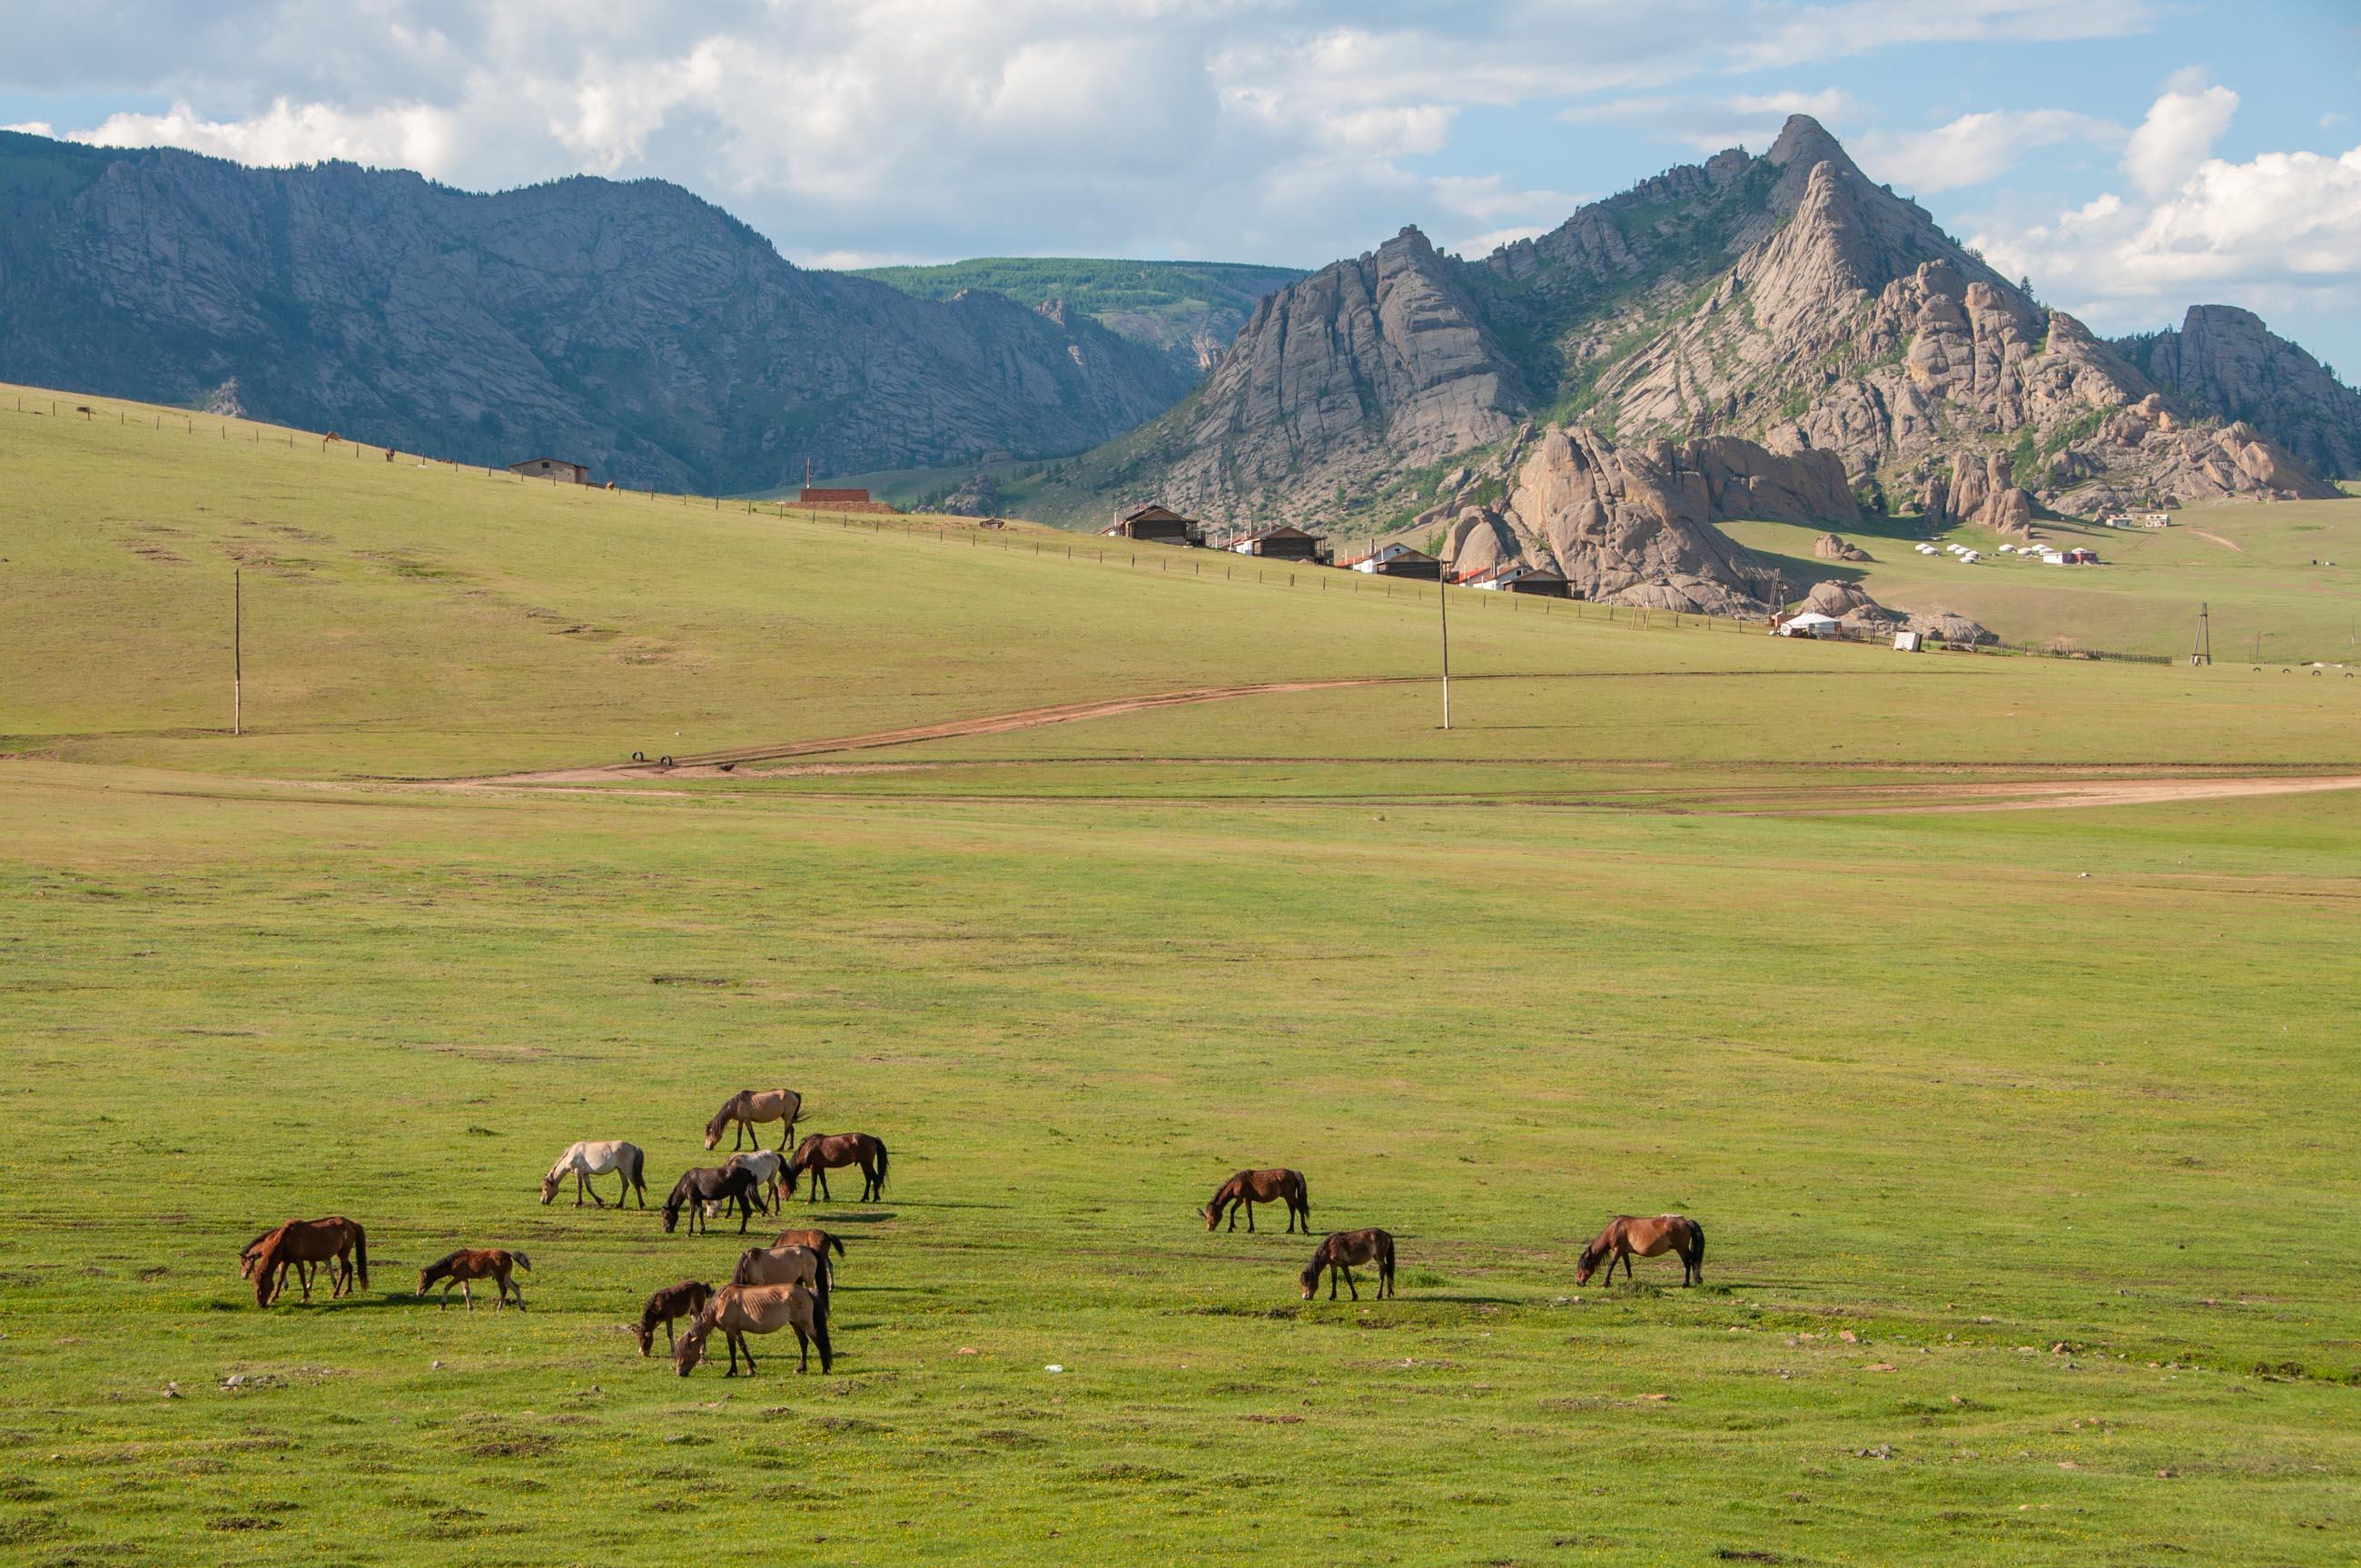 https://bubo.sk/uploads/galleries/4924/tomaskubus_mongolsko_terelj_mongolska_krajina_transsib.jpg